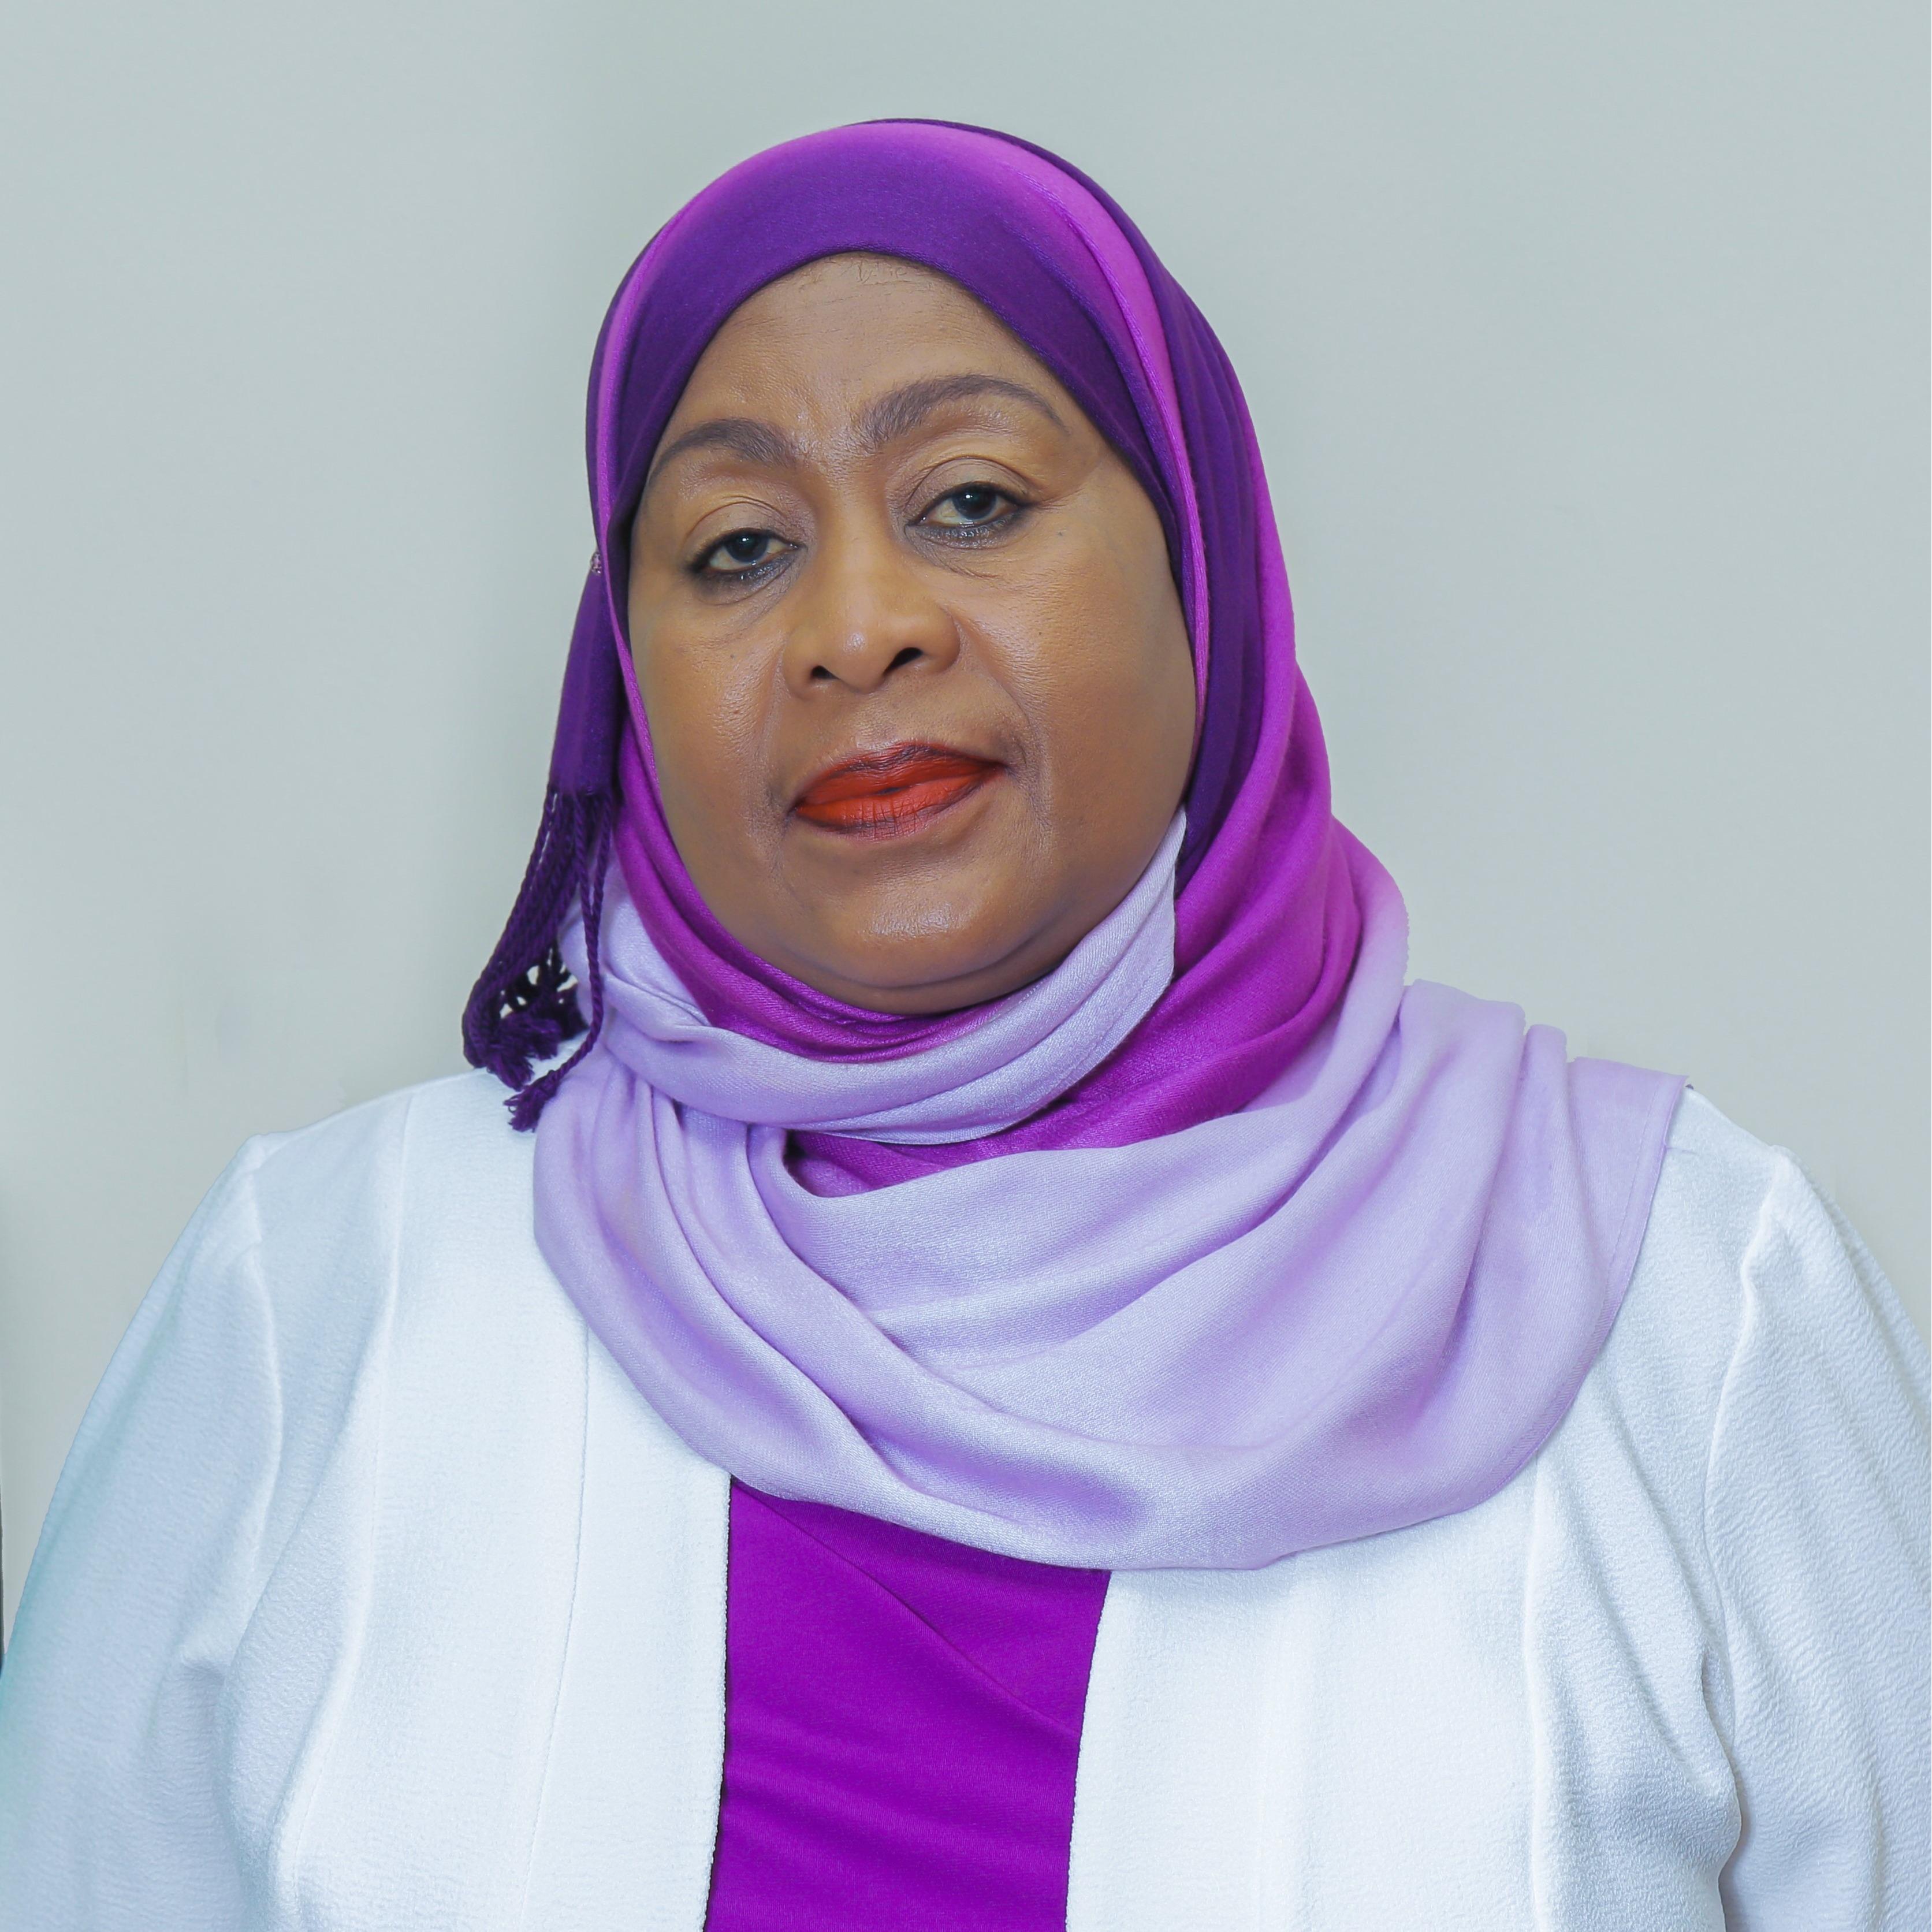 H.E. Samia Suluhu Hassan